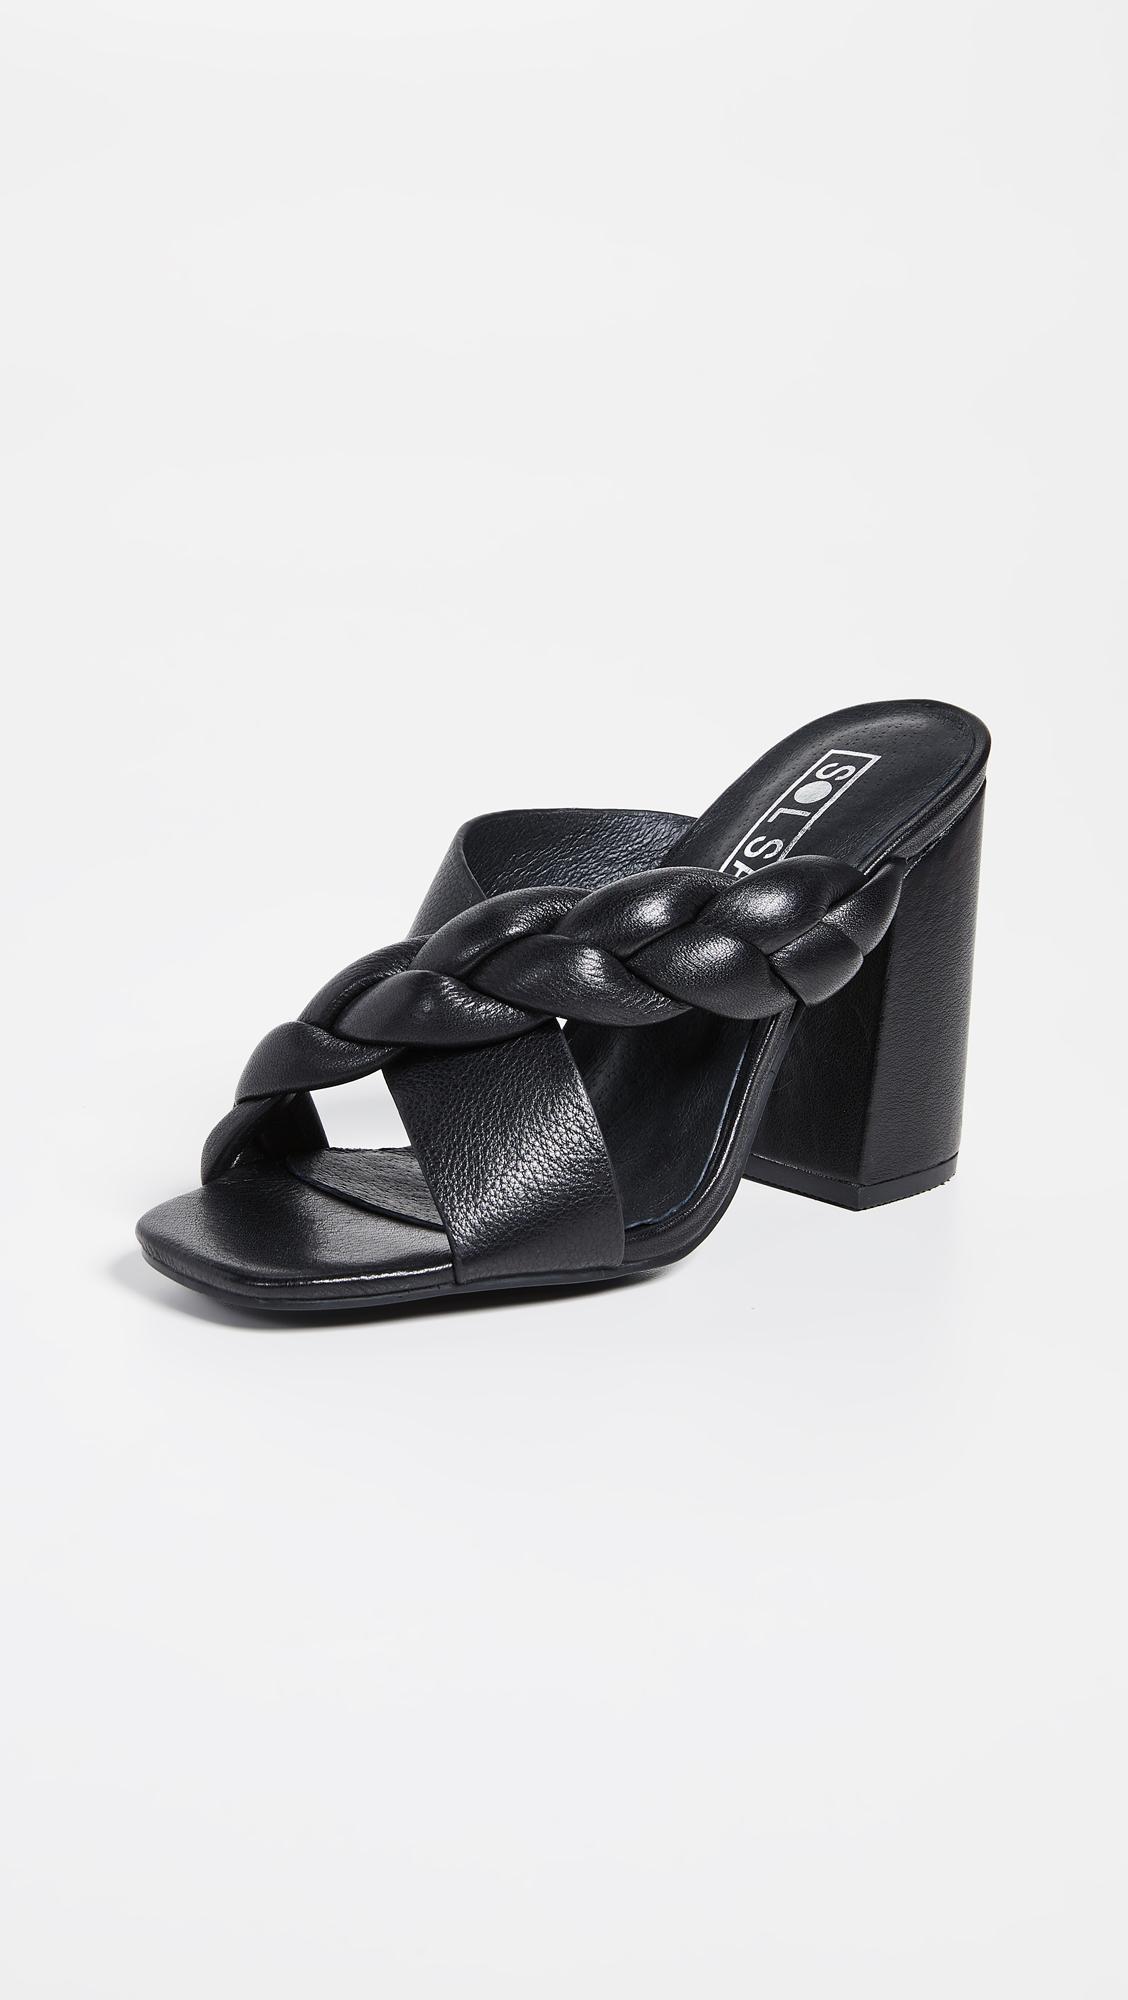 c2b347a04b113 Women's Black Jovy Block Heel Mules